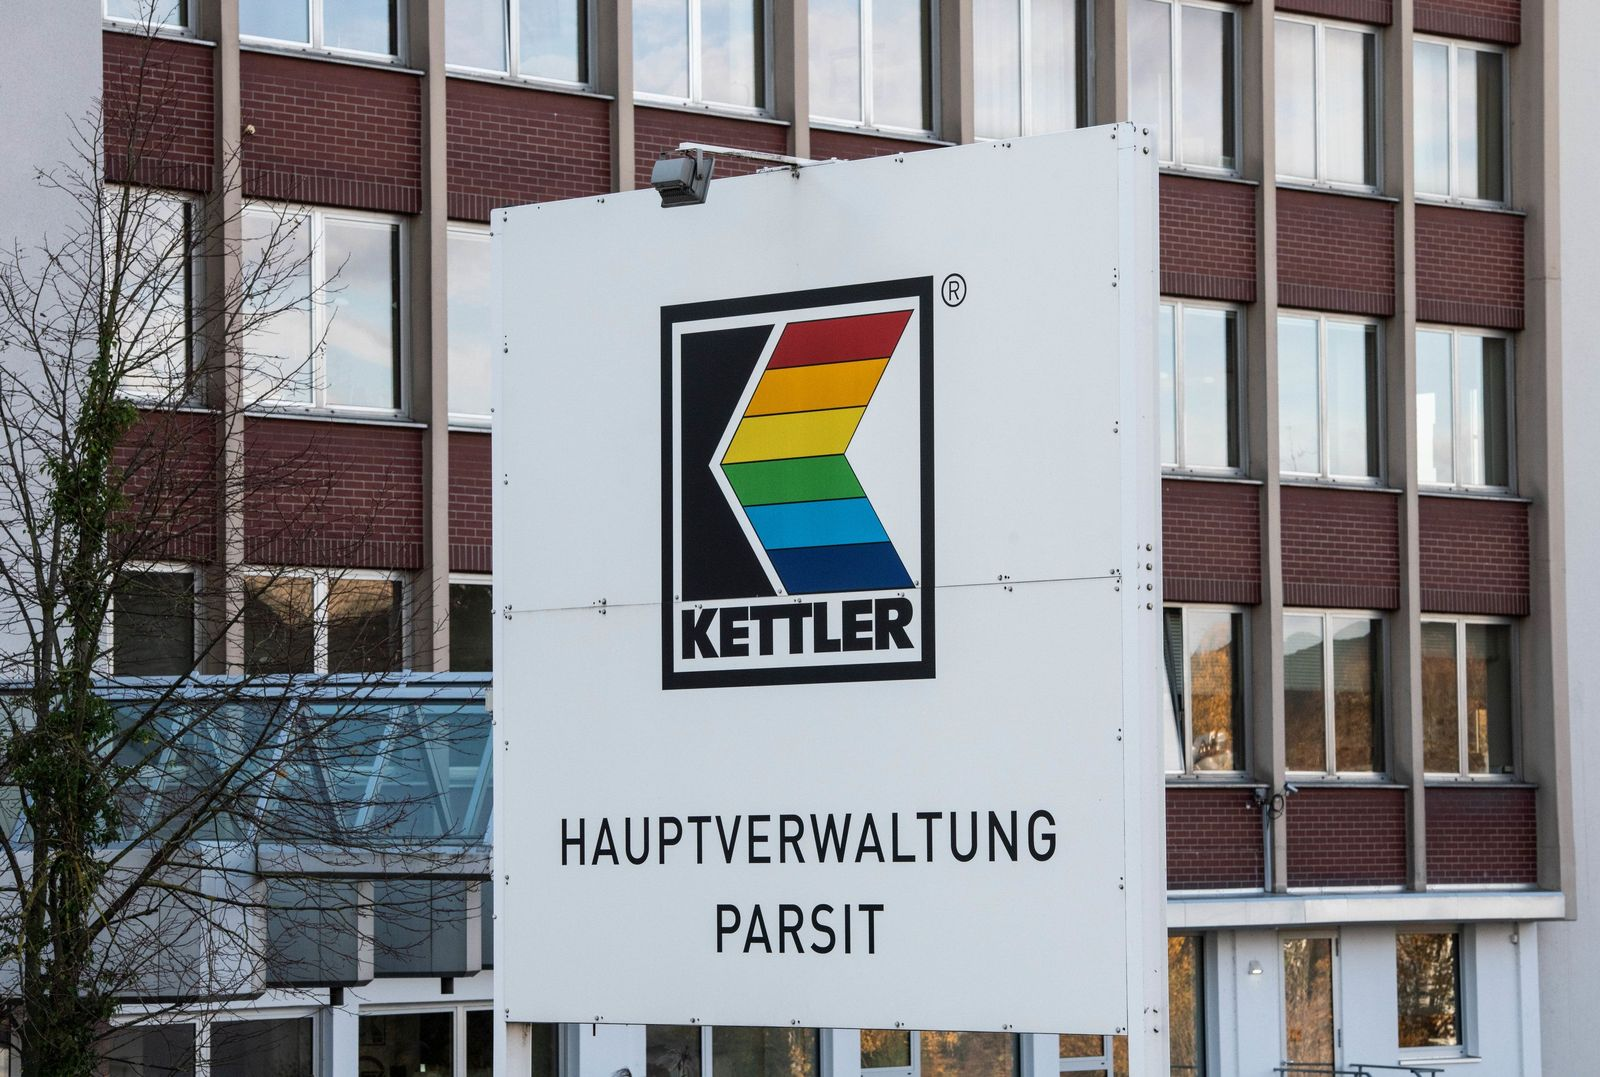 Insolvenz bei Kettcar-Hersteller Kettler